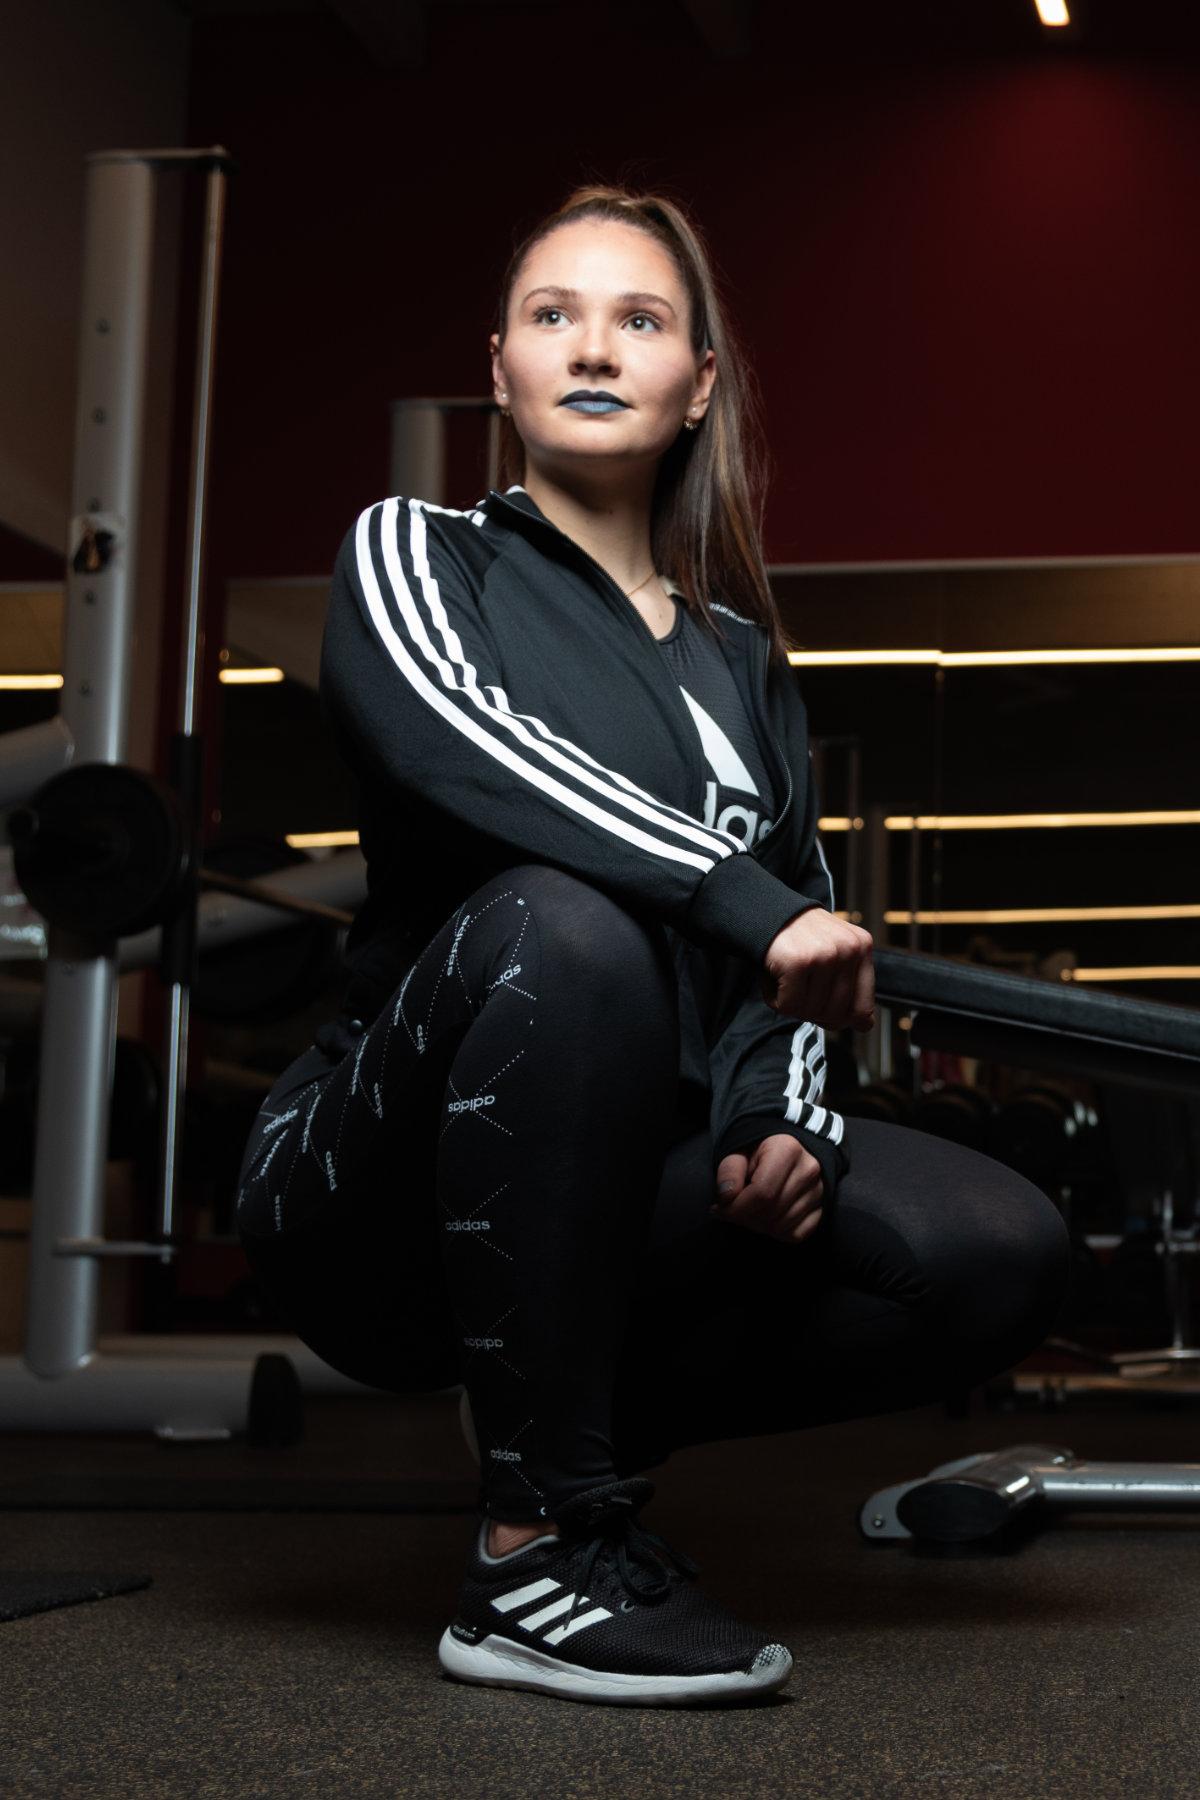 Trainerin Lena